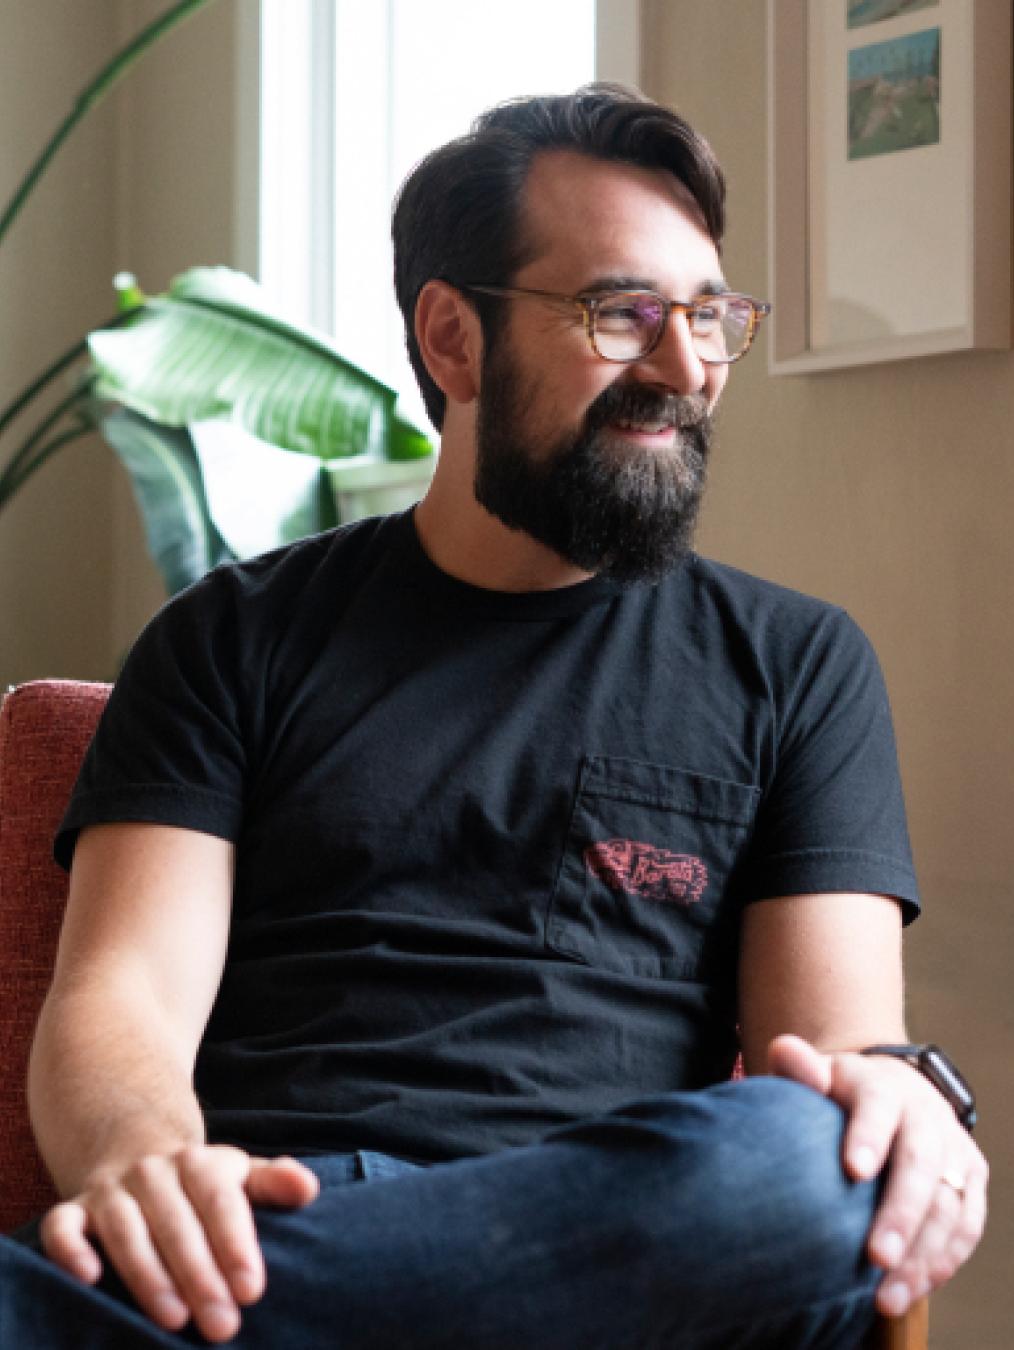 Alex Kocher - Design Lead